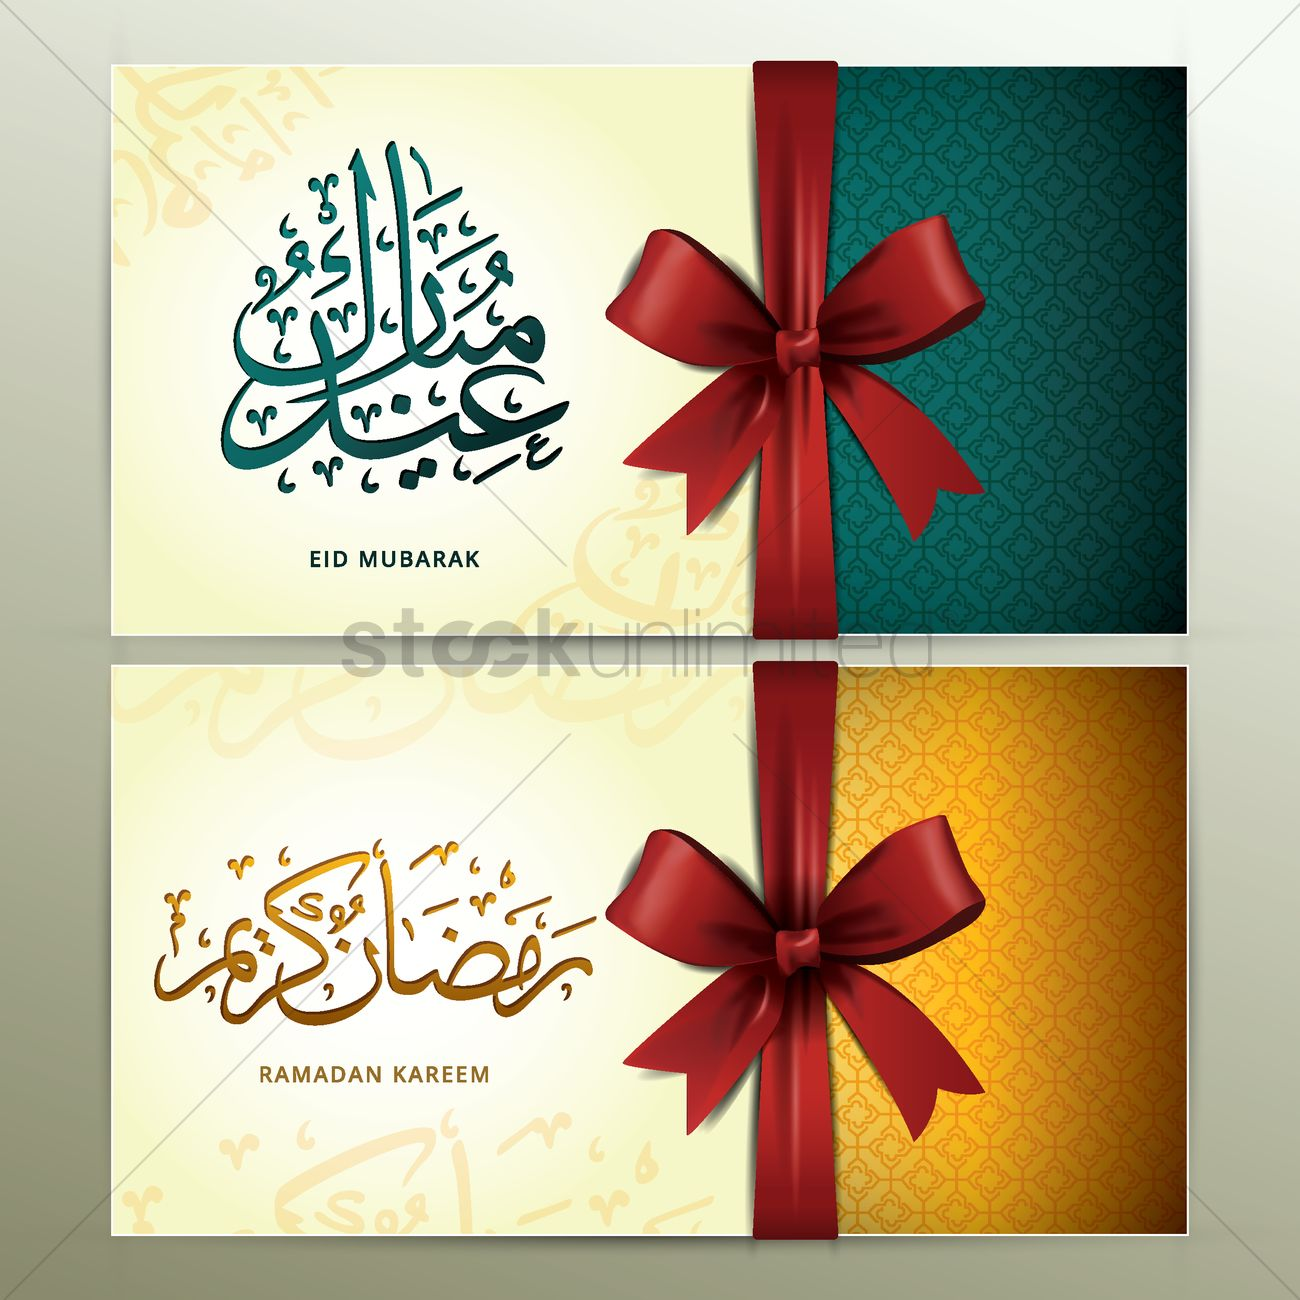 Eid Mubarak And Ramadan Kareem Greeting Vector Image 1828189